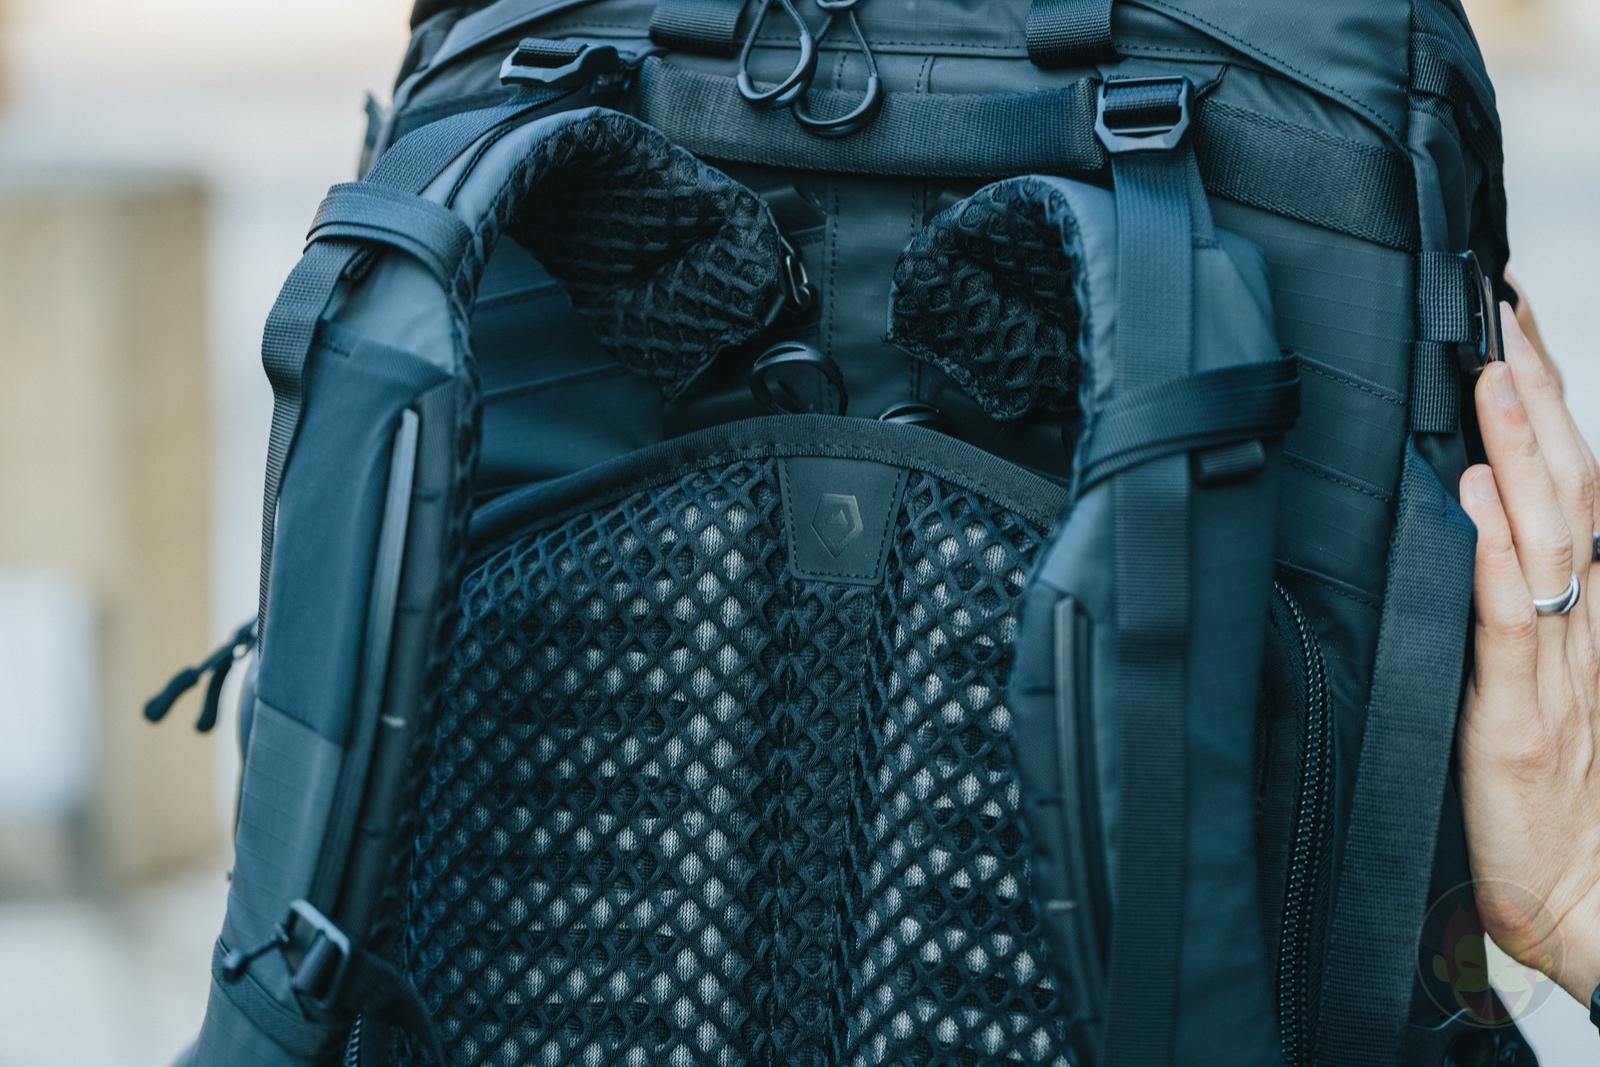 WANDRD FERNWEH Backpack Review 26